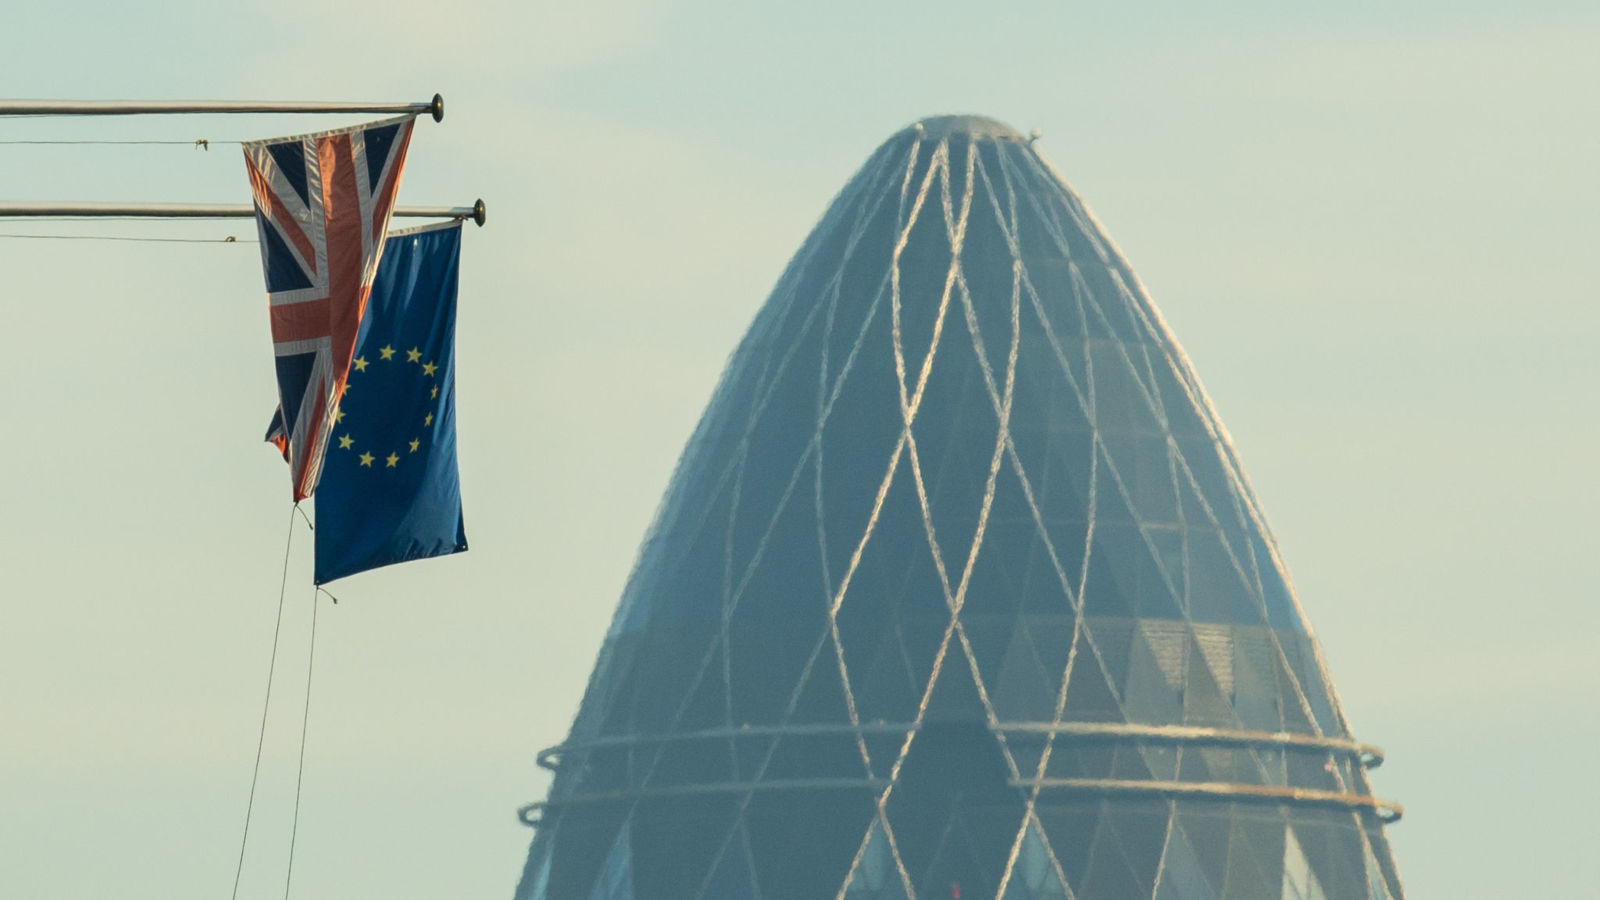 Buy-to-let lender to unveil £500m flotation